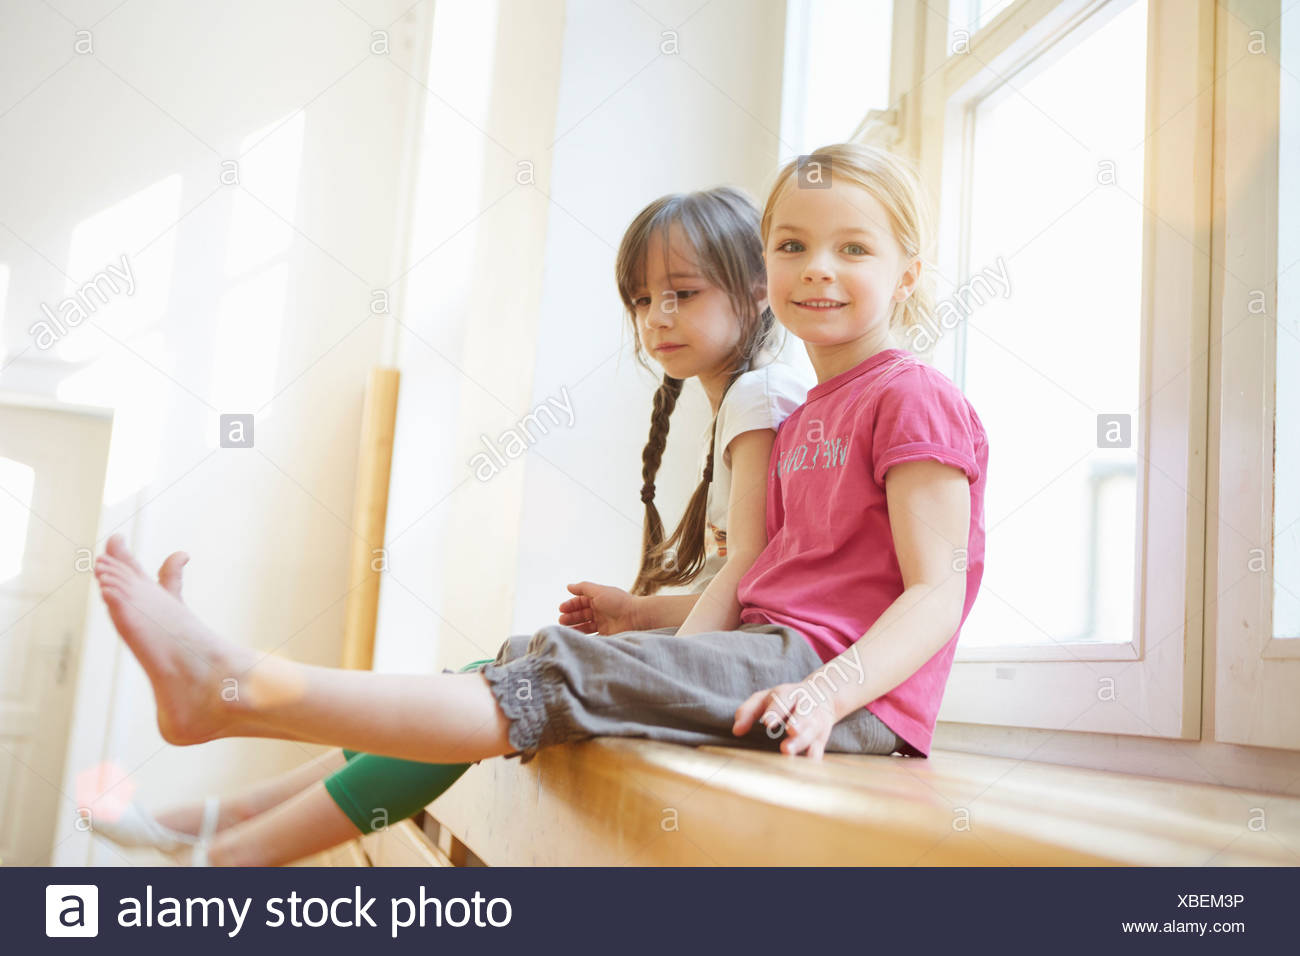 Girls sitting on apparatus in school hall - Stock Image